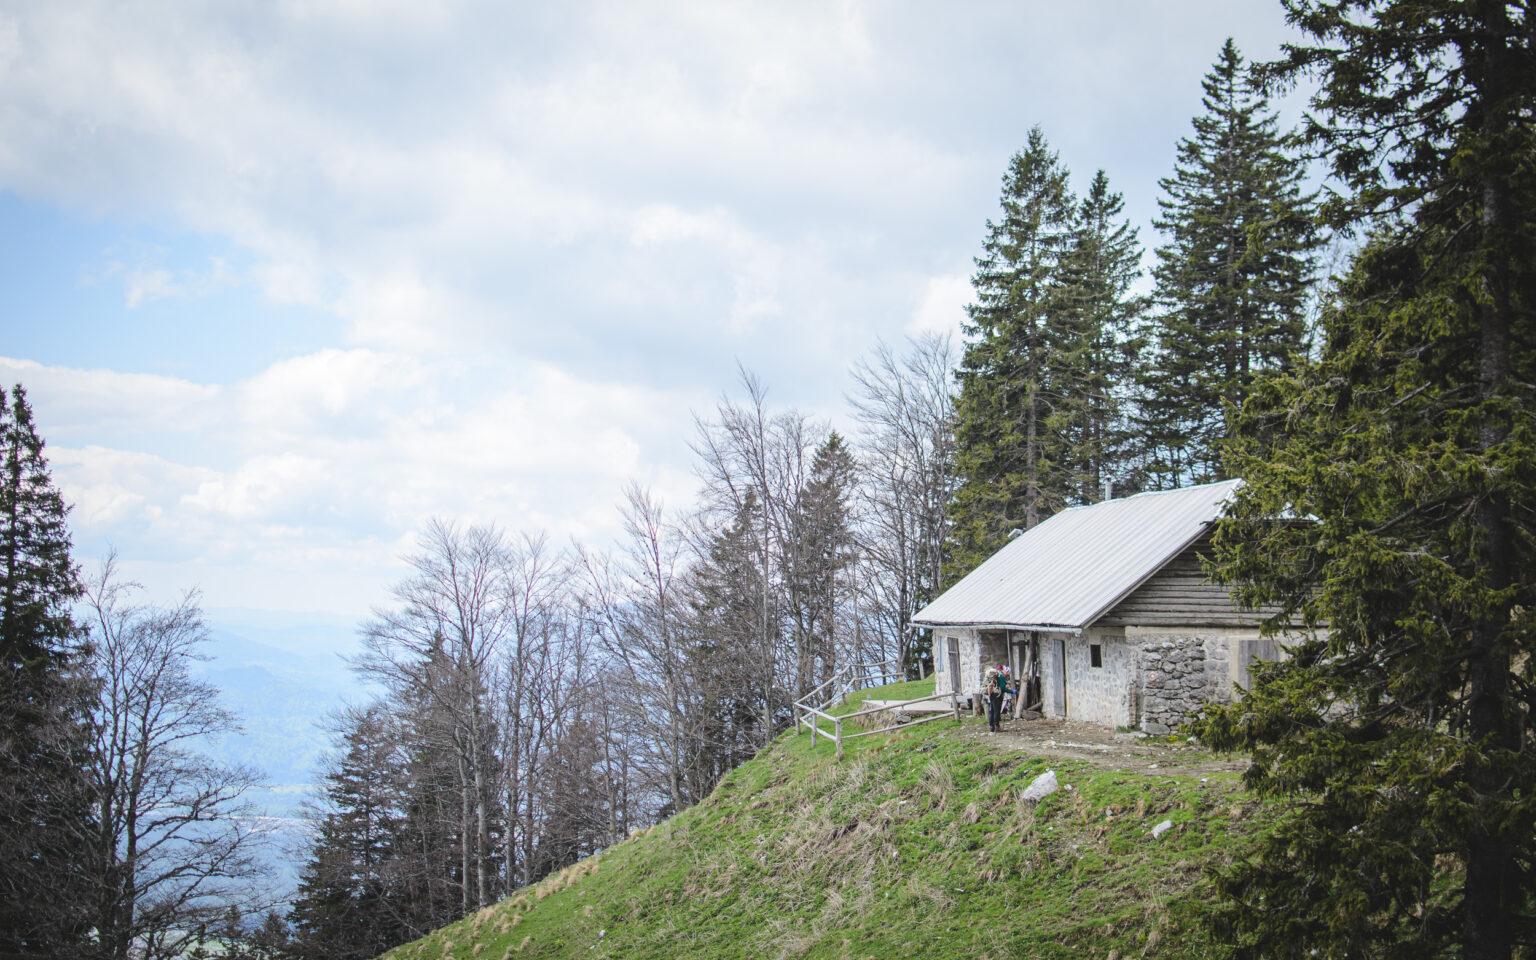 Chata stojąca na polanie w górach